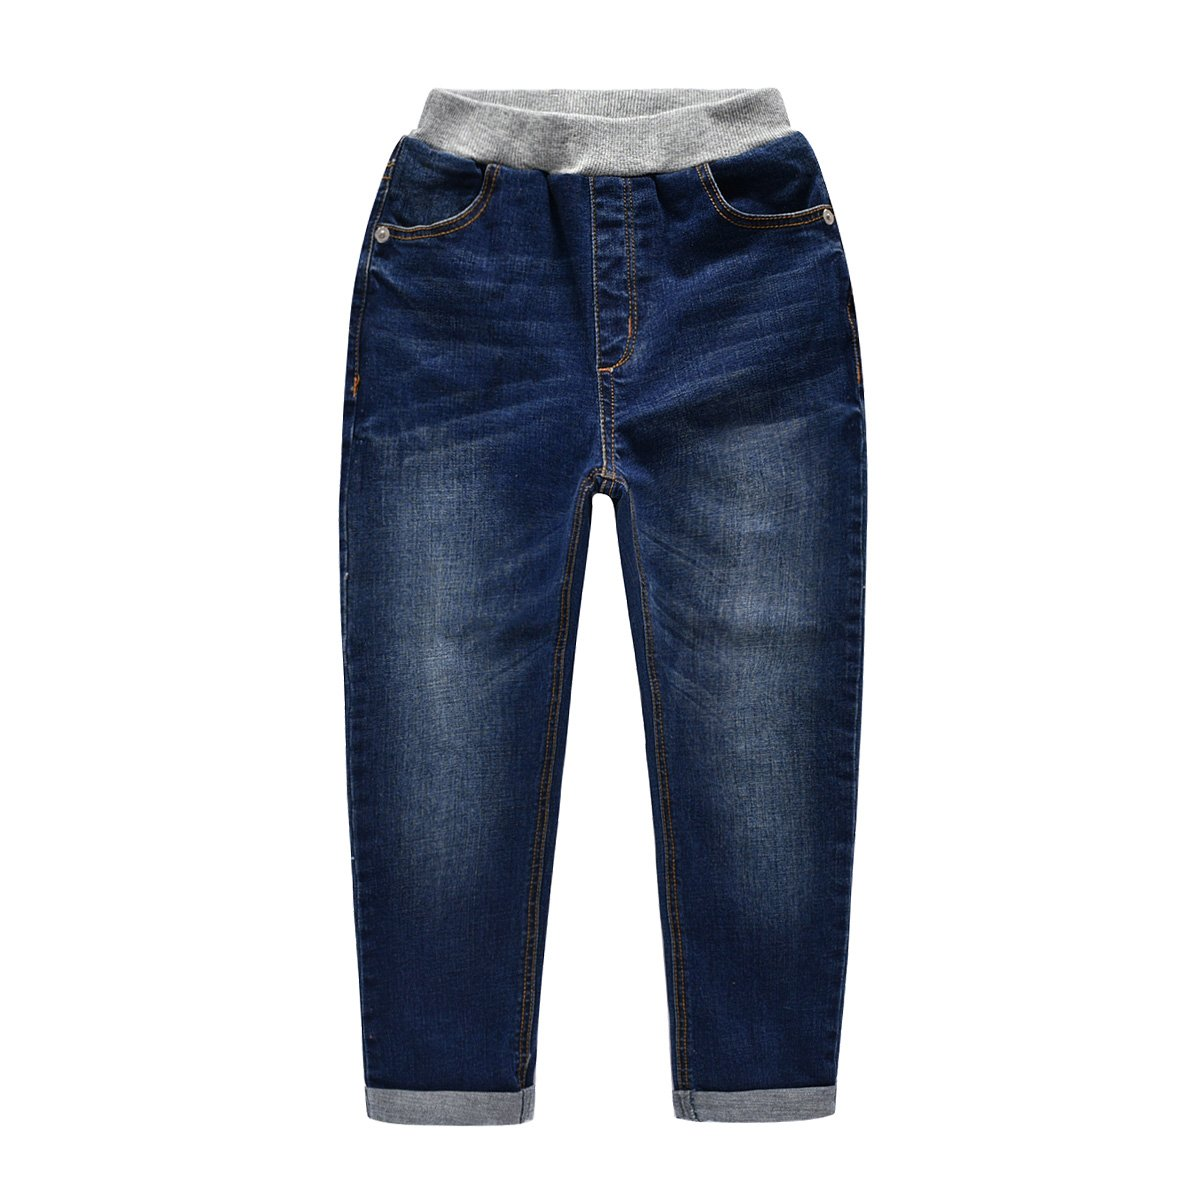 NABER Kids Boys' Casual Elastic Waist Denim Pants Blue Washed Jeans Age 4-13 Yrs